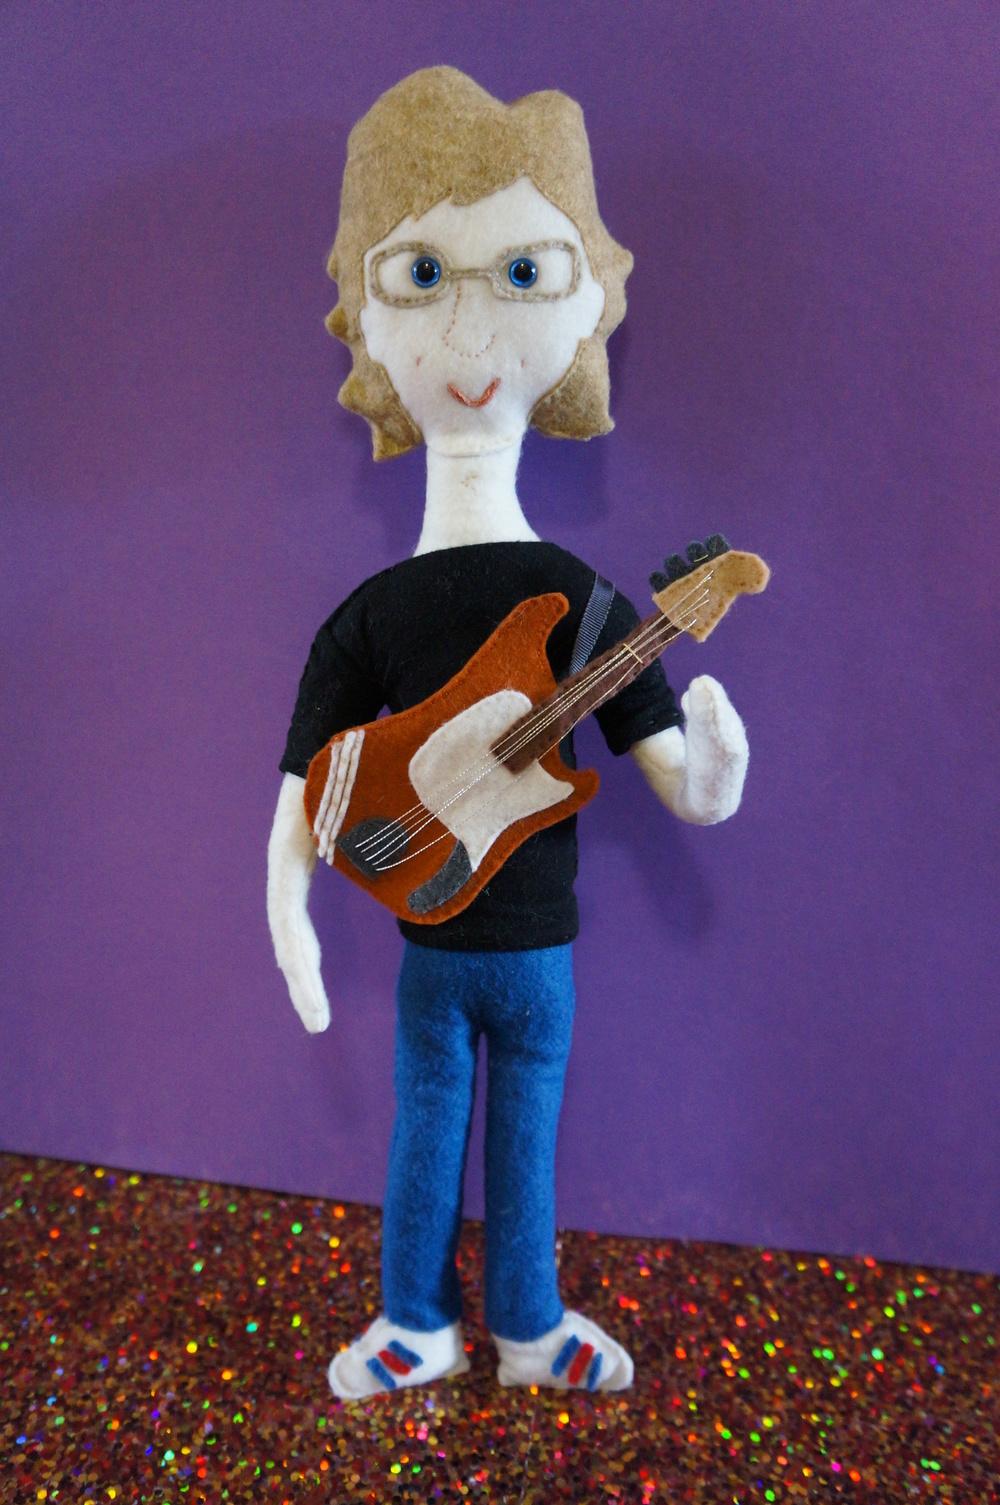 Chris Murphy from Sloan doll